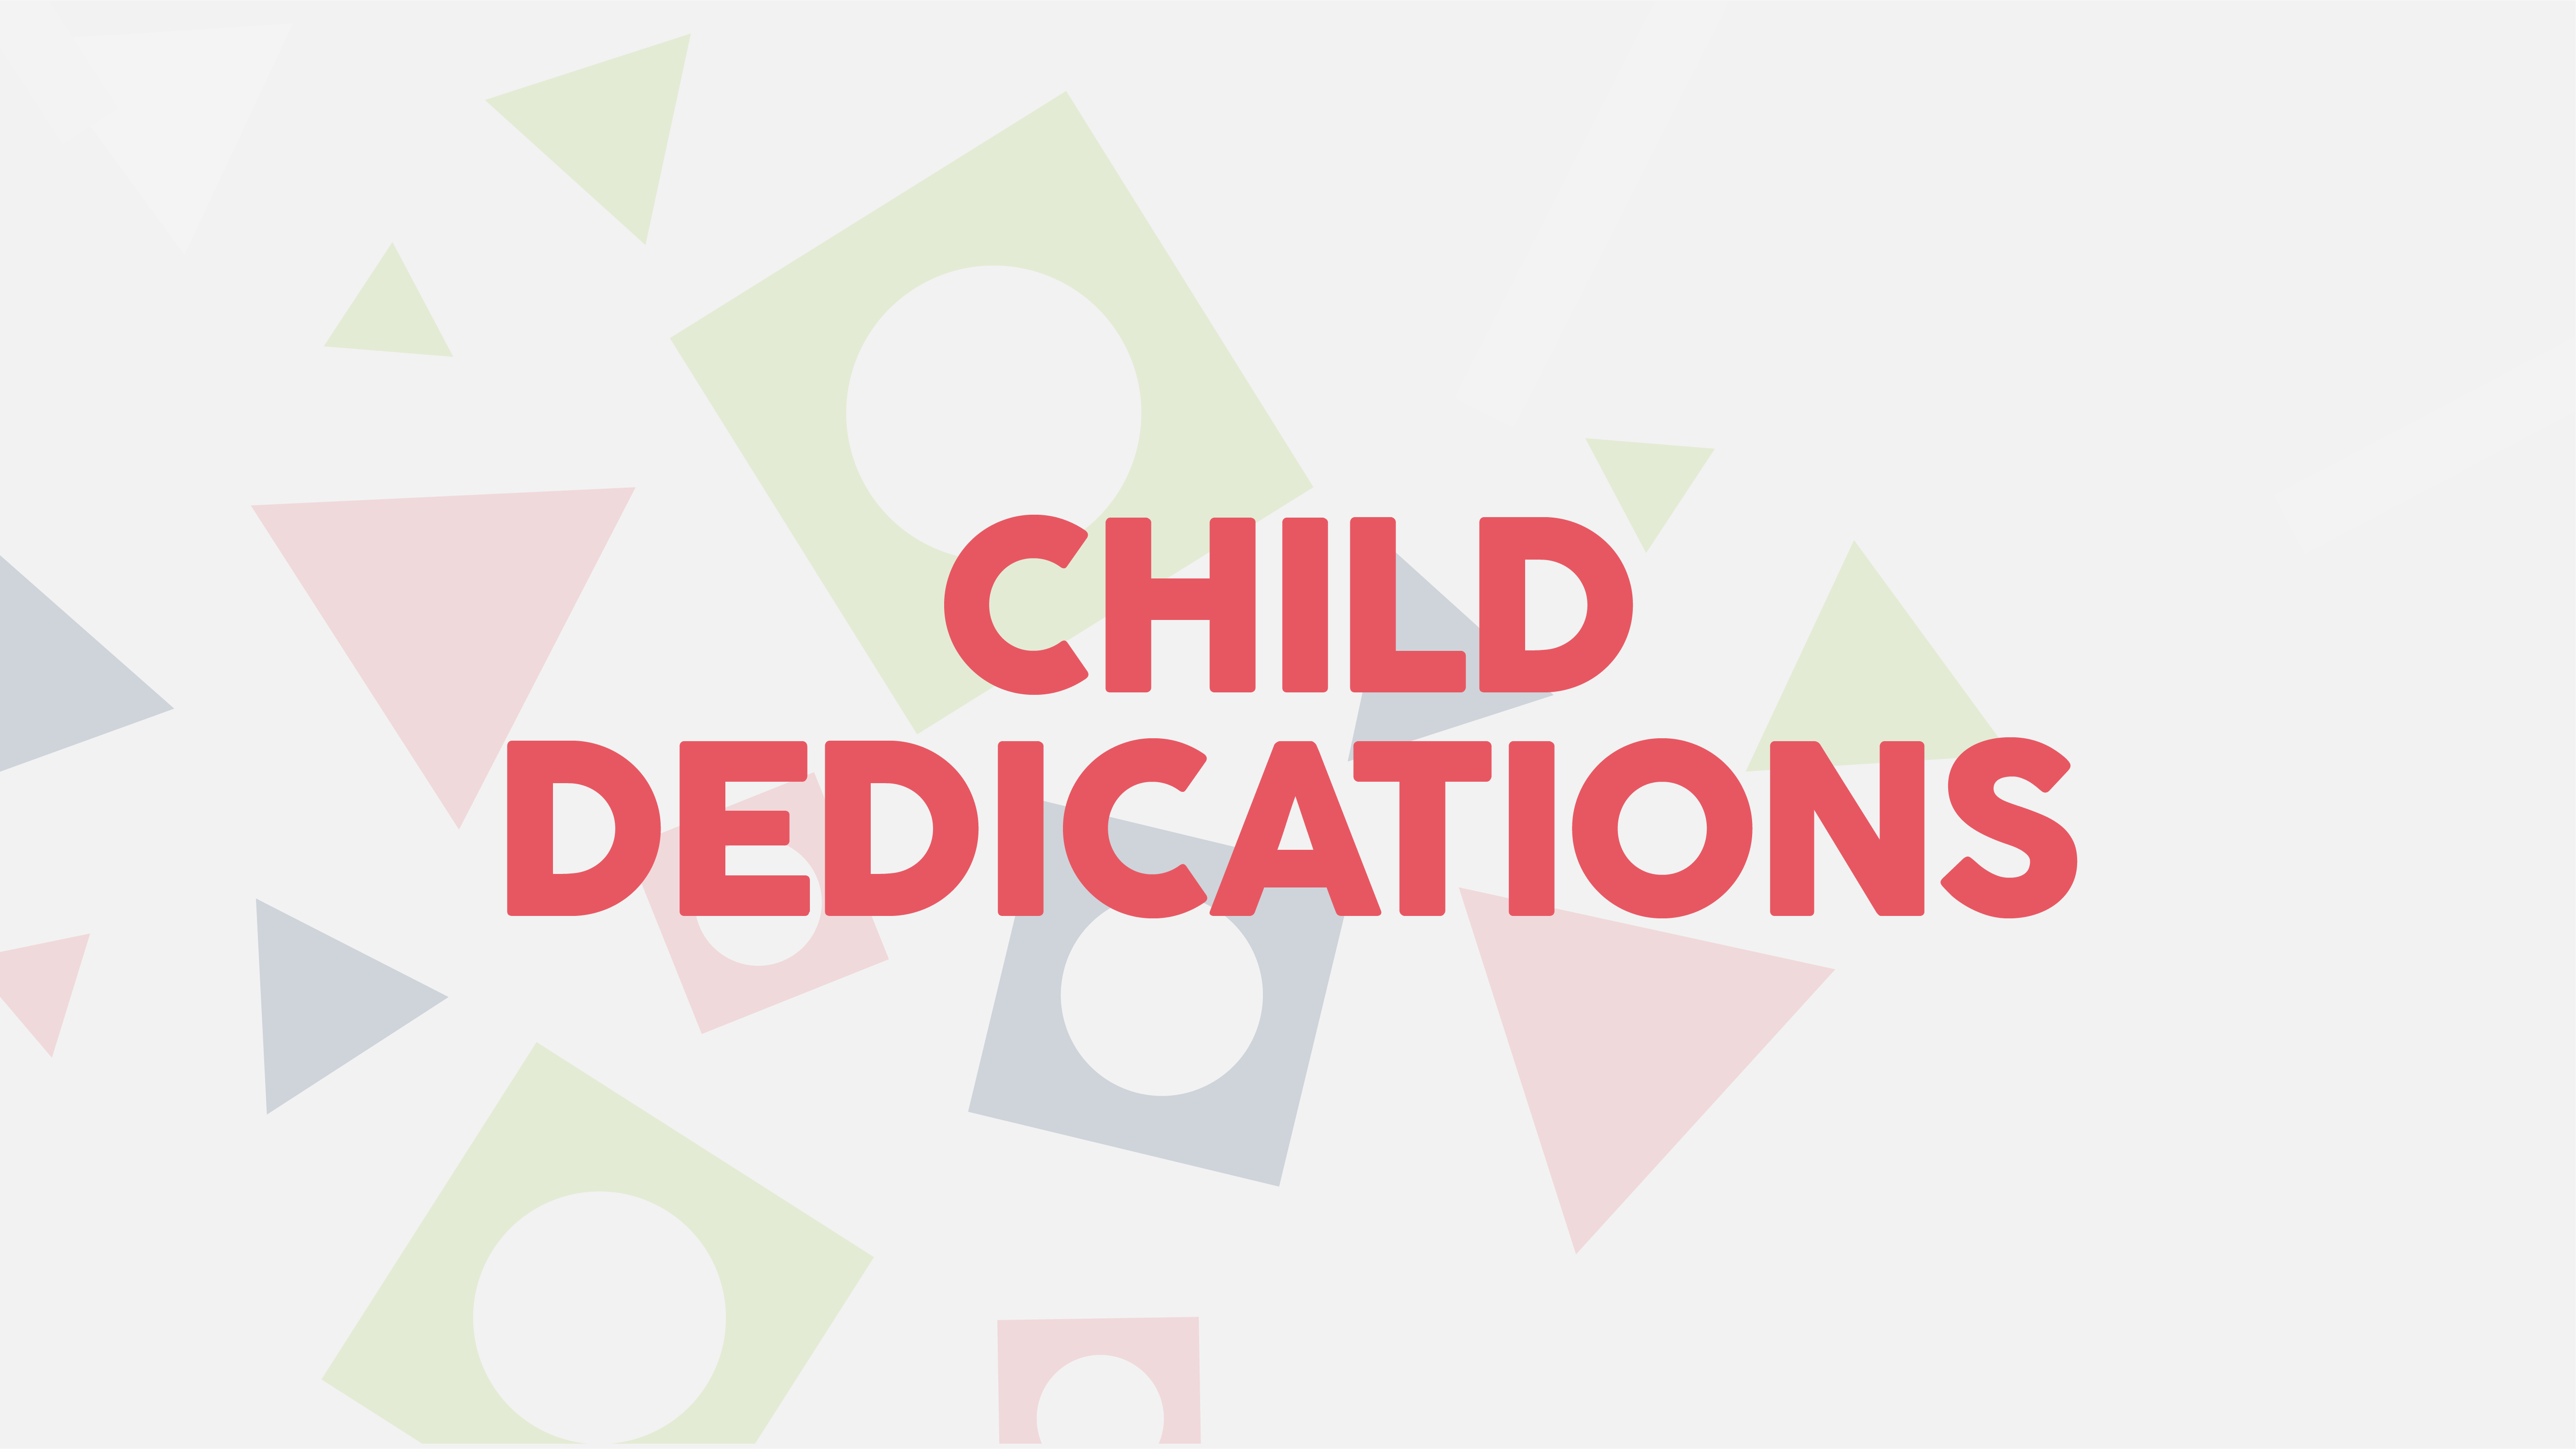 Child dedications 03